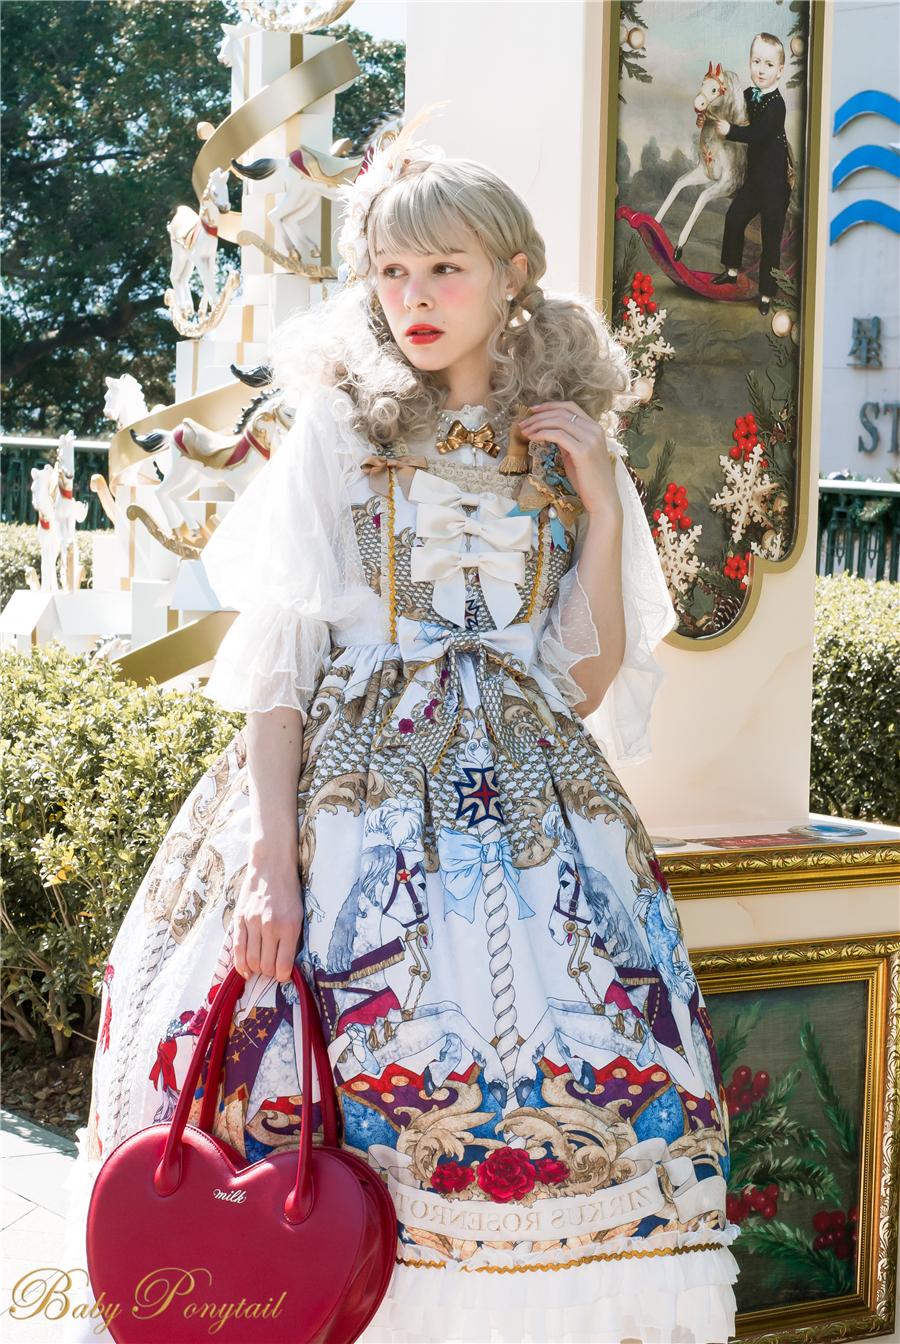 Baby Ponytail_Circus Princess_Silver JSK_Claudia14.jpg